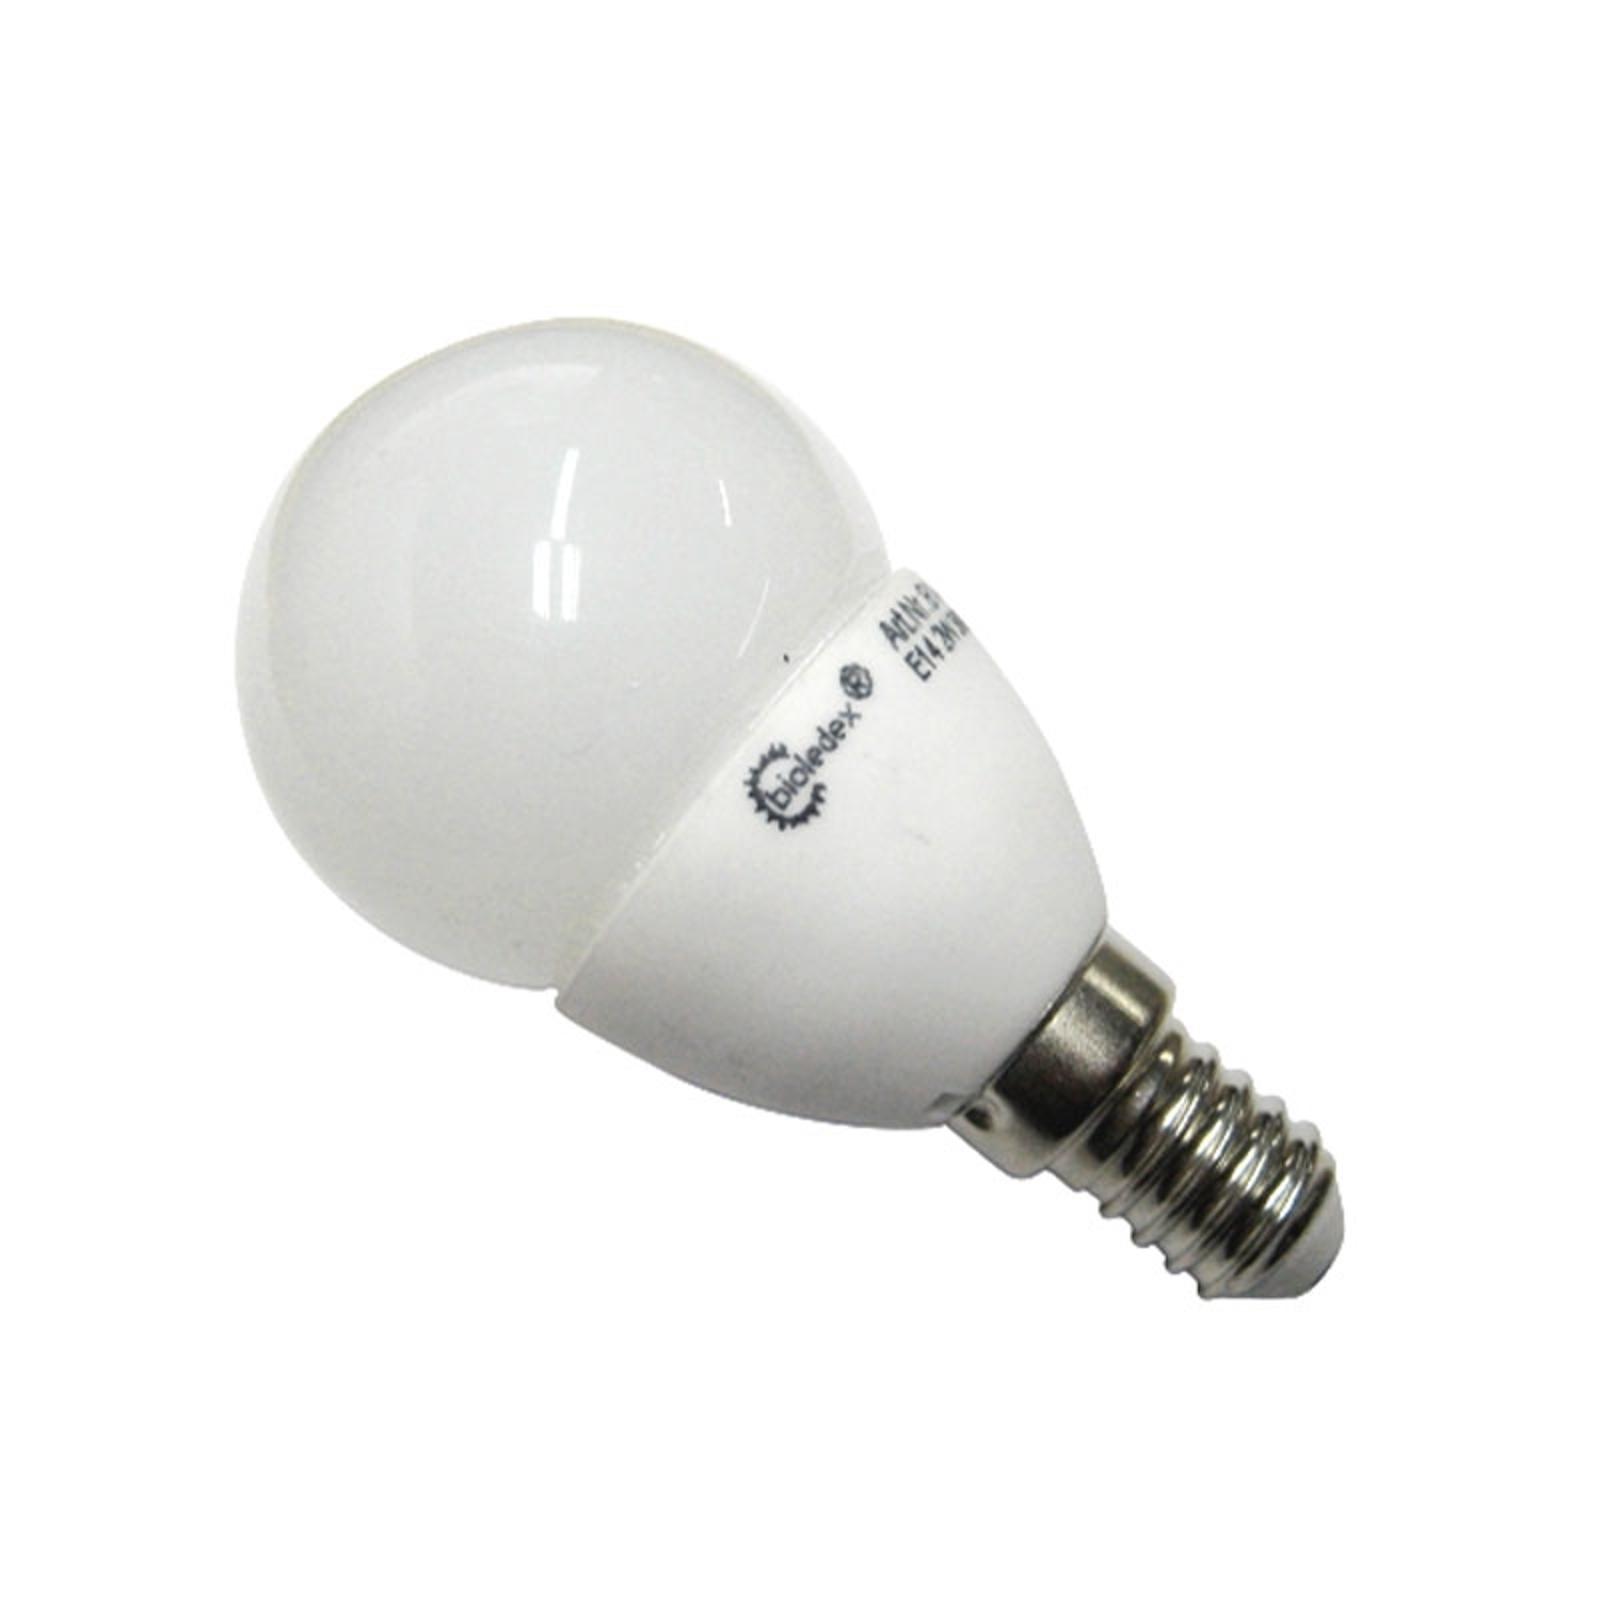 E14 3W LED light bulb Tema in tear form_2515007_1